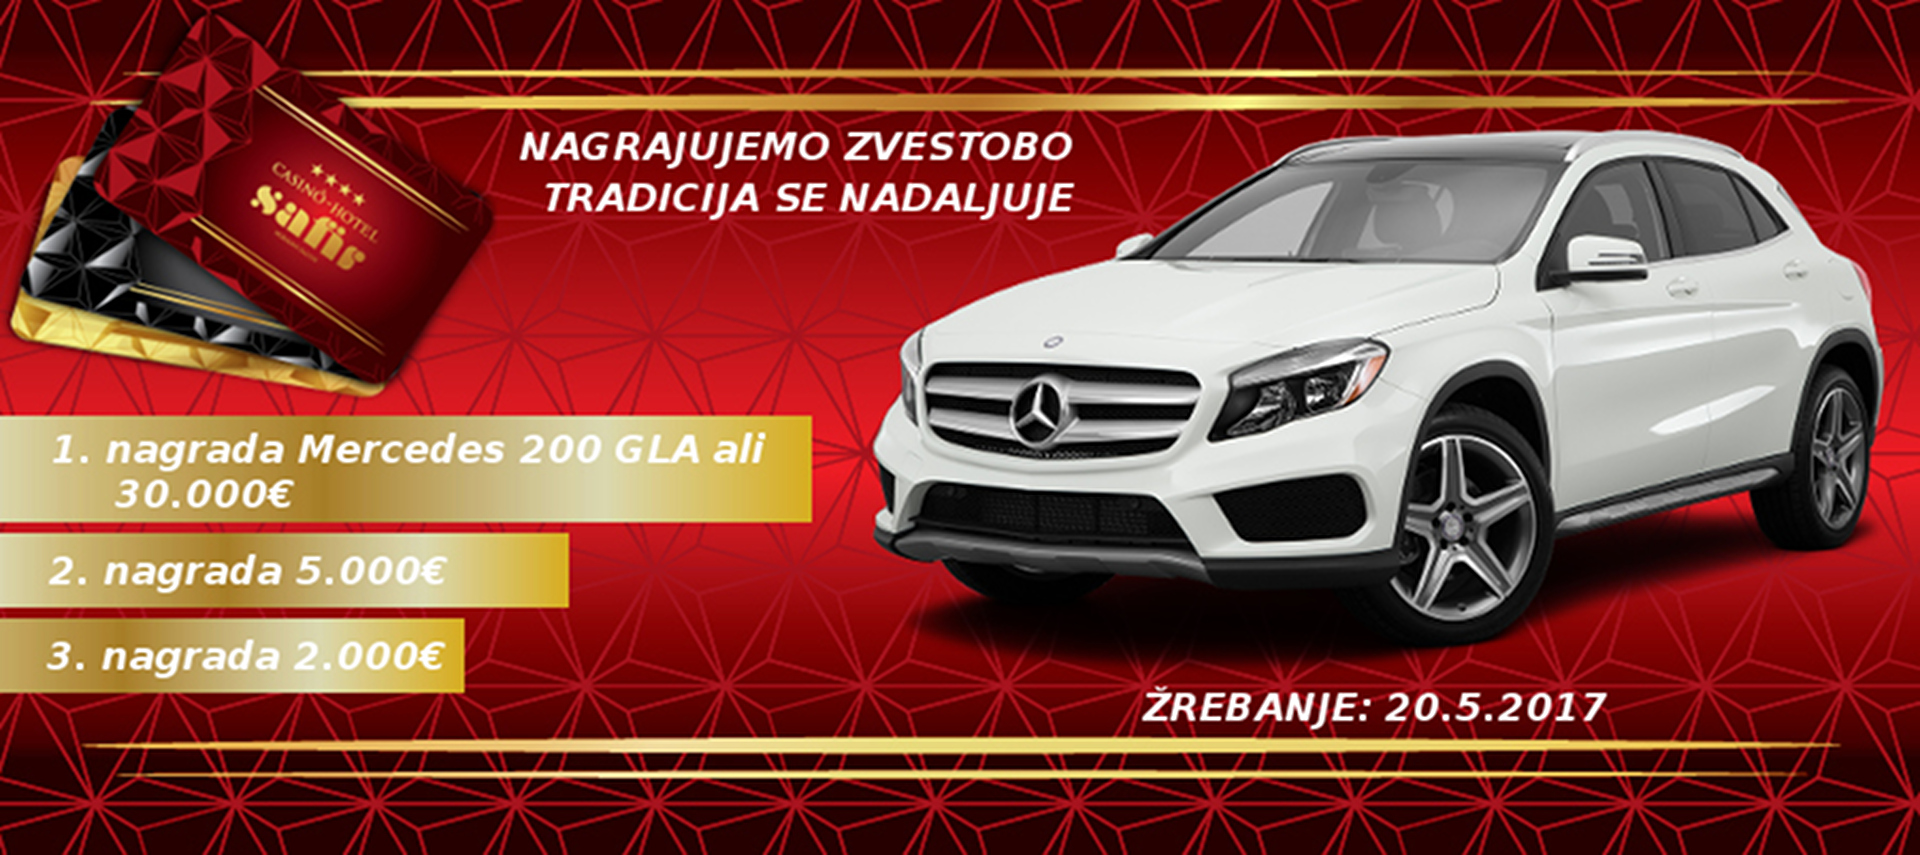 36_Ozadje table safir banner 1920×855-01-noviGLA-SLO